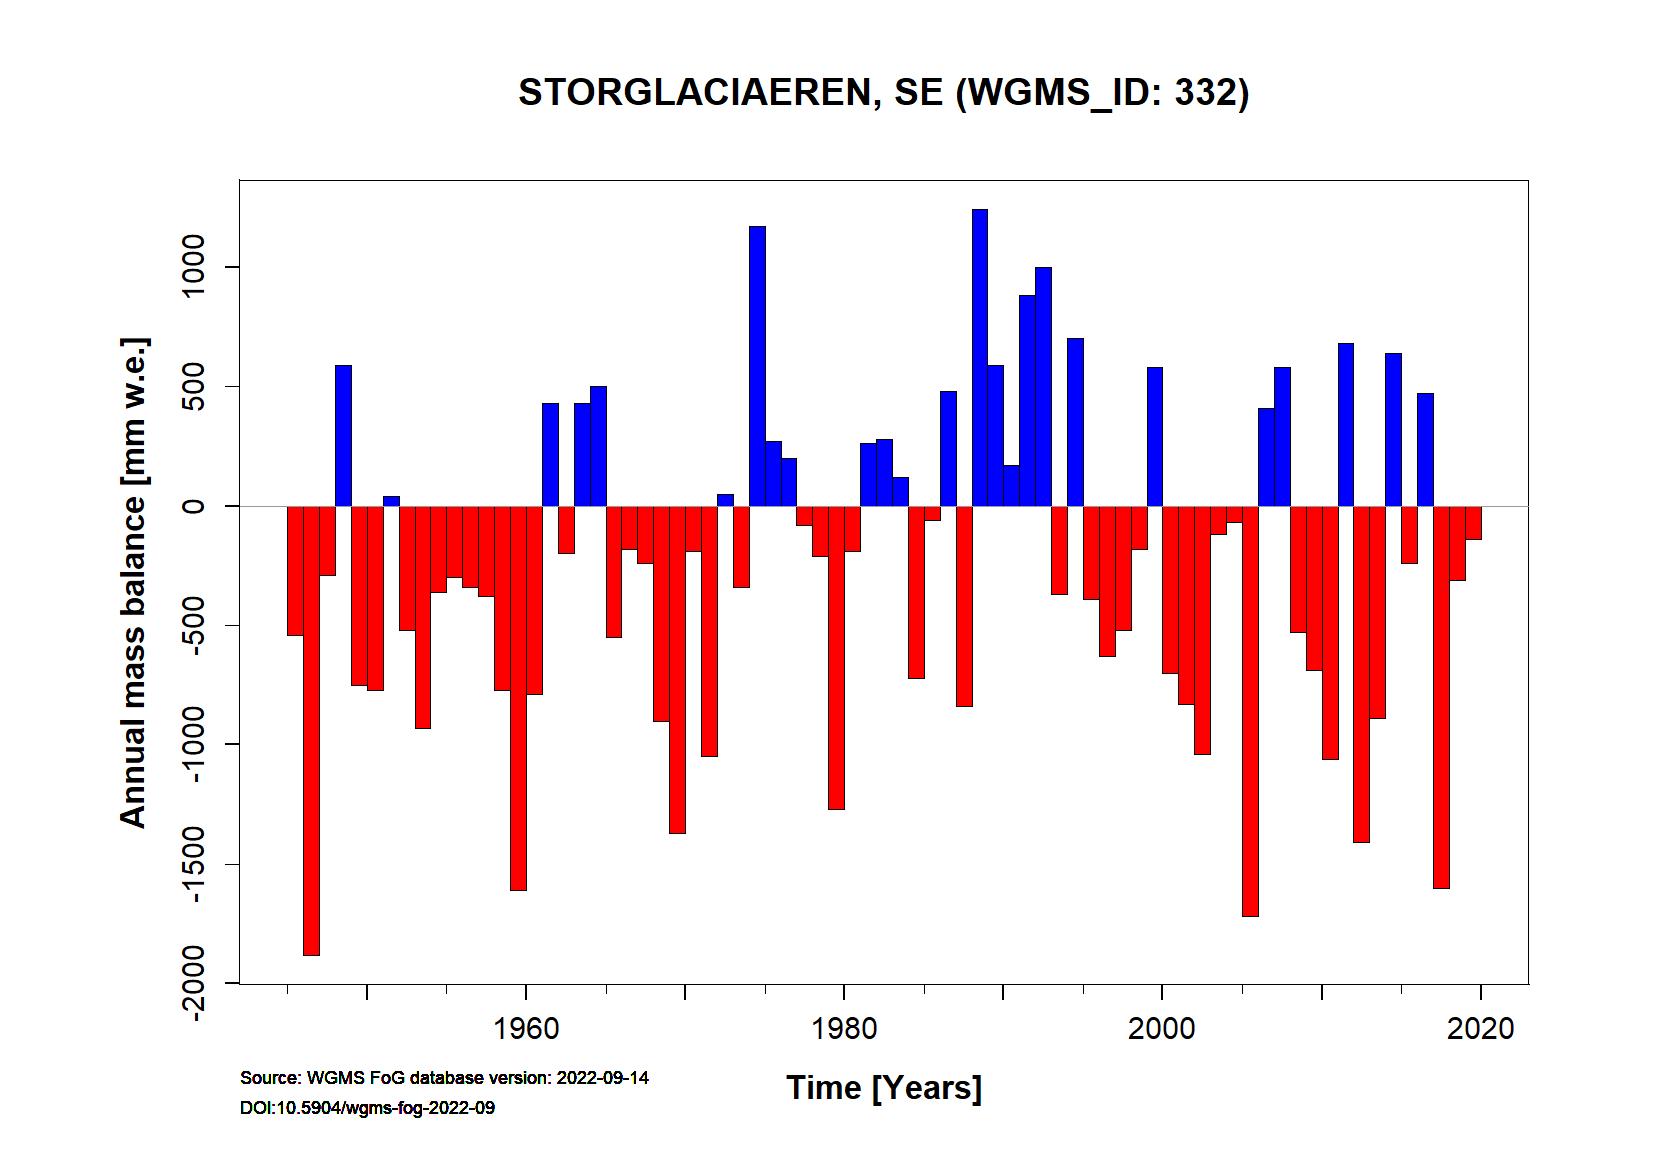 Storglaciaeren Annual Mass Balance (WGMS, 2016)